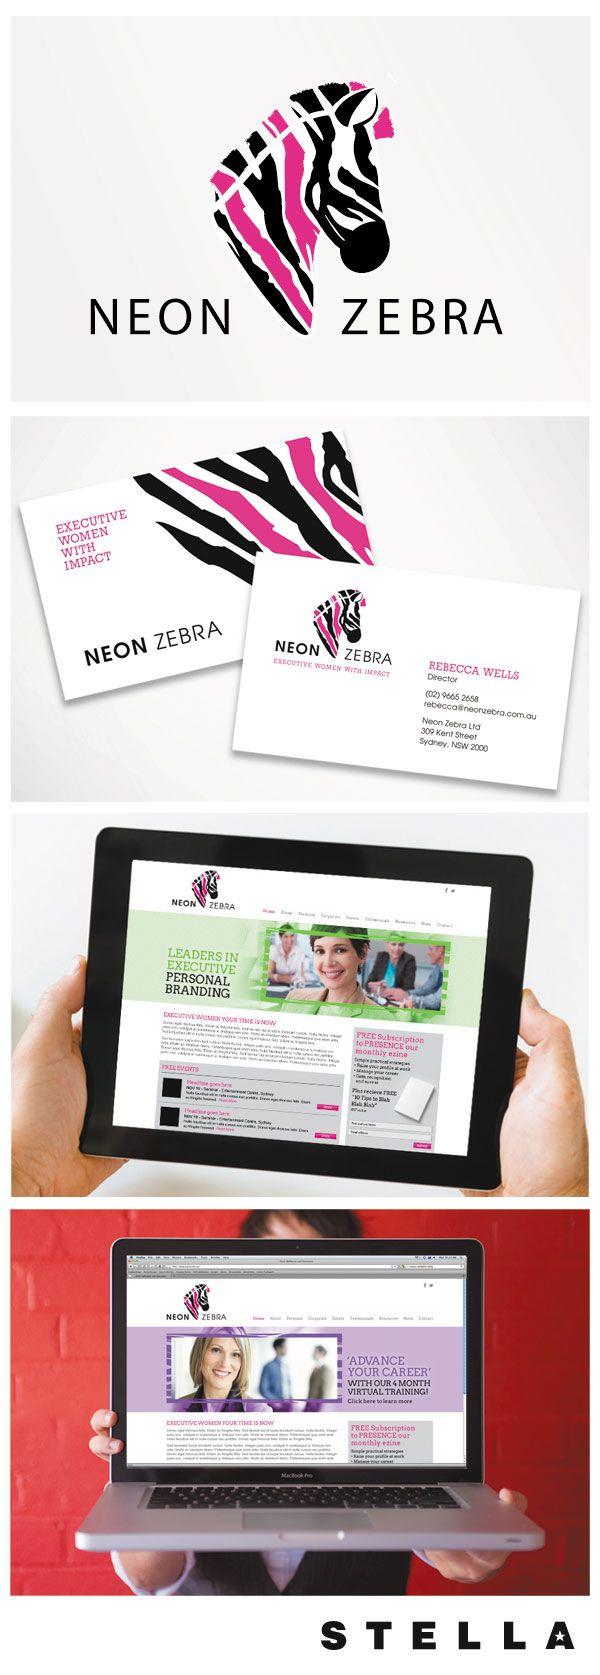 Some recent #LogoDesign  #WebDesign from Stella Design for Neon Zebra, an Executive Coach for Women